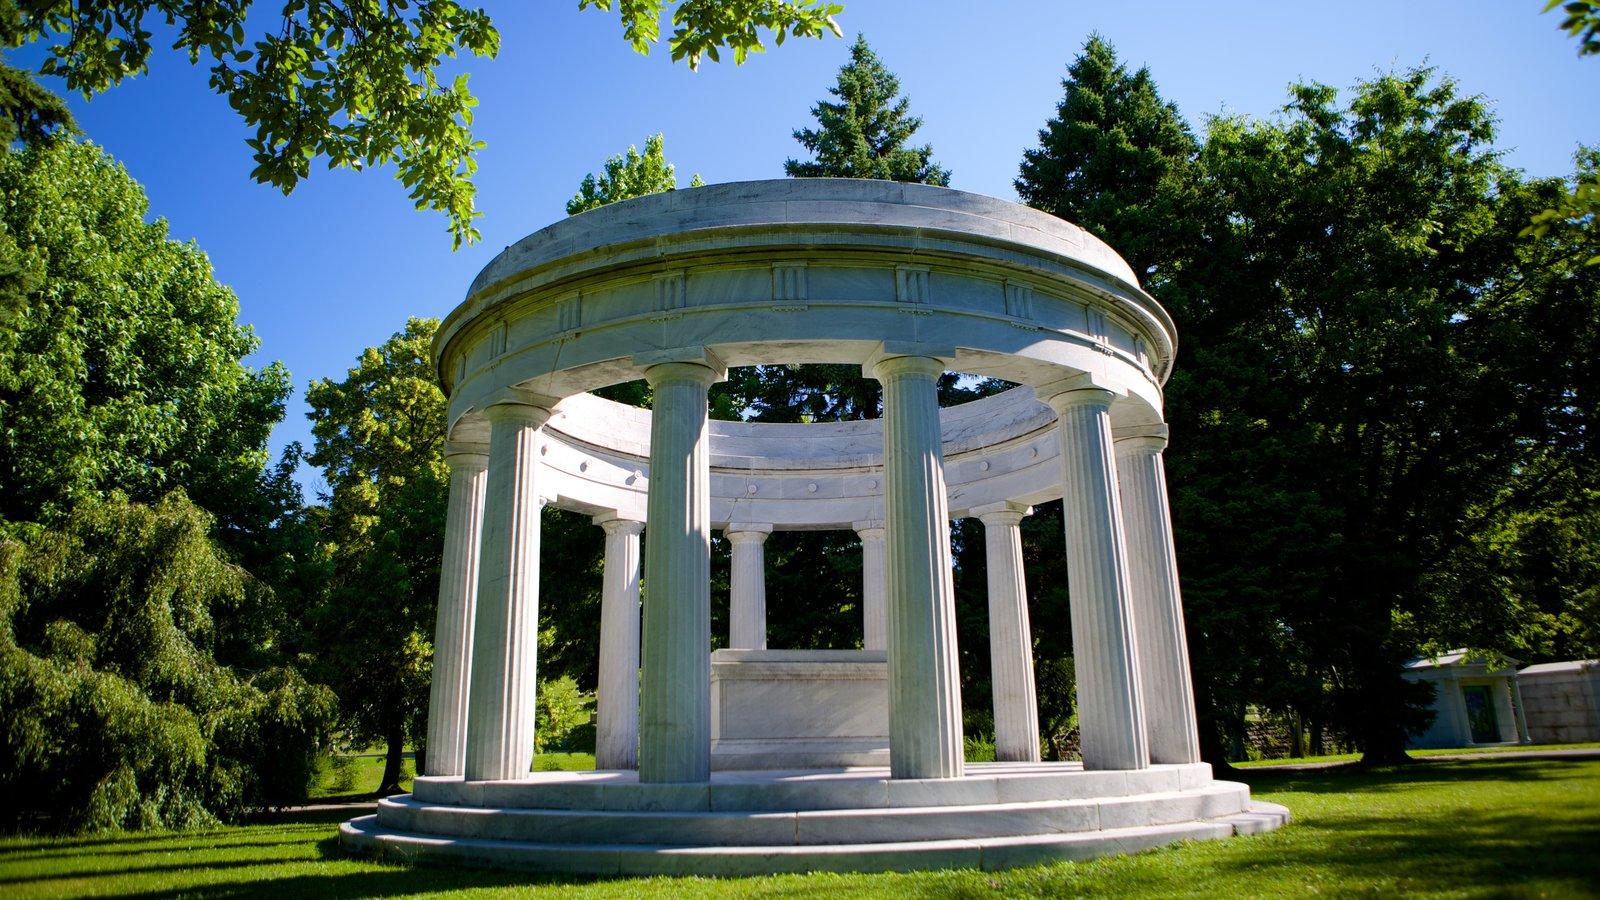 Forest Lawn Cemetery caracterizando um cemitério e elementos de patrimônio